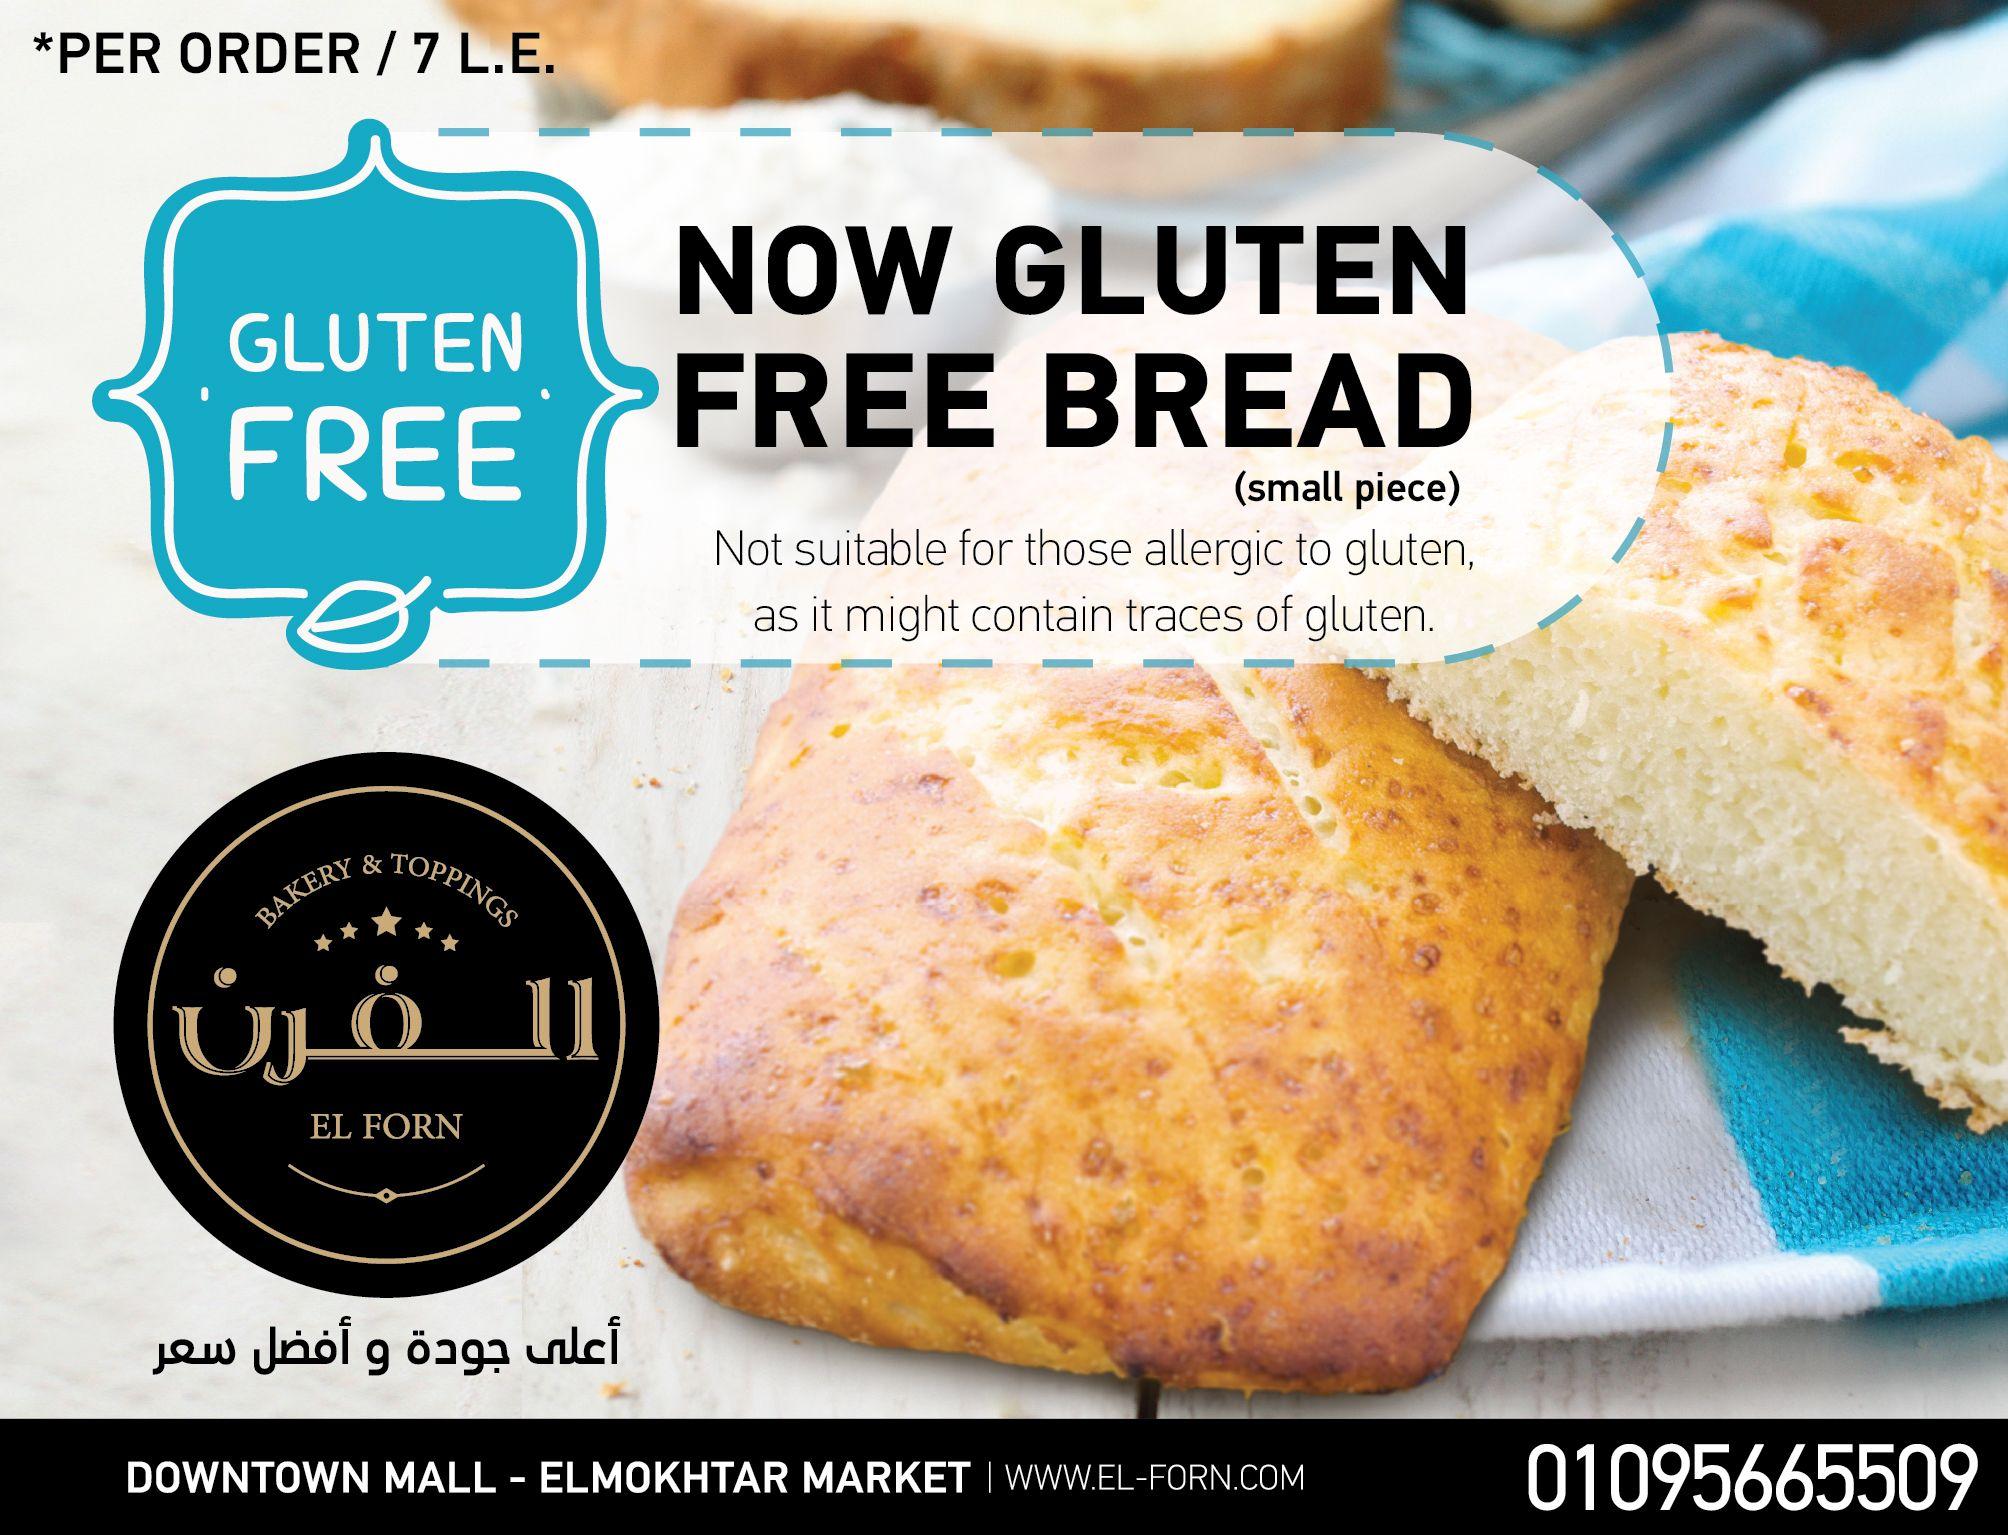 Gluten Free Bread From El Forn عيش خالي من الجلوتين من الفرن لخدمة التوصيل اتصل بfor Delivery Call 01095665509 Not Suitable For Th Gluten Free Food Toppings